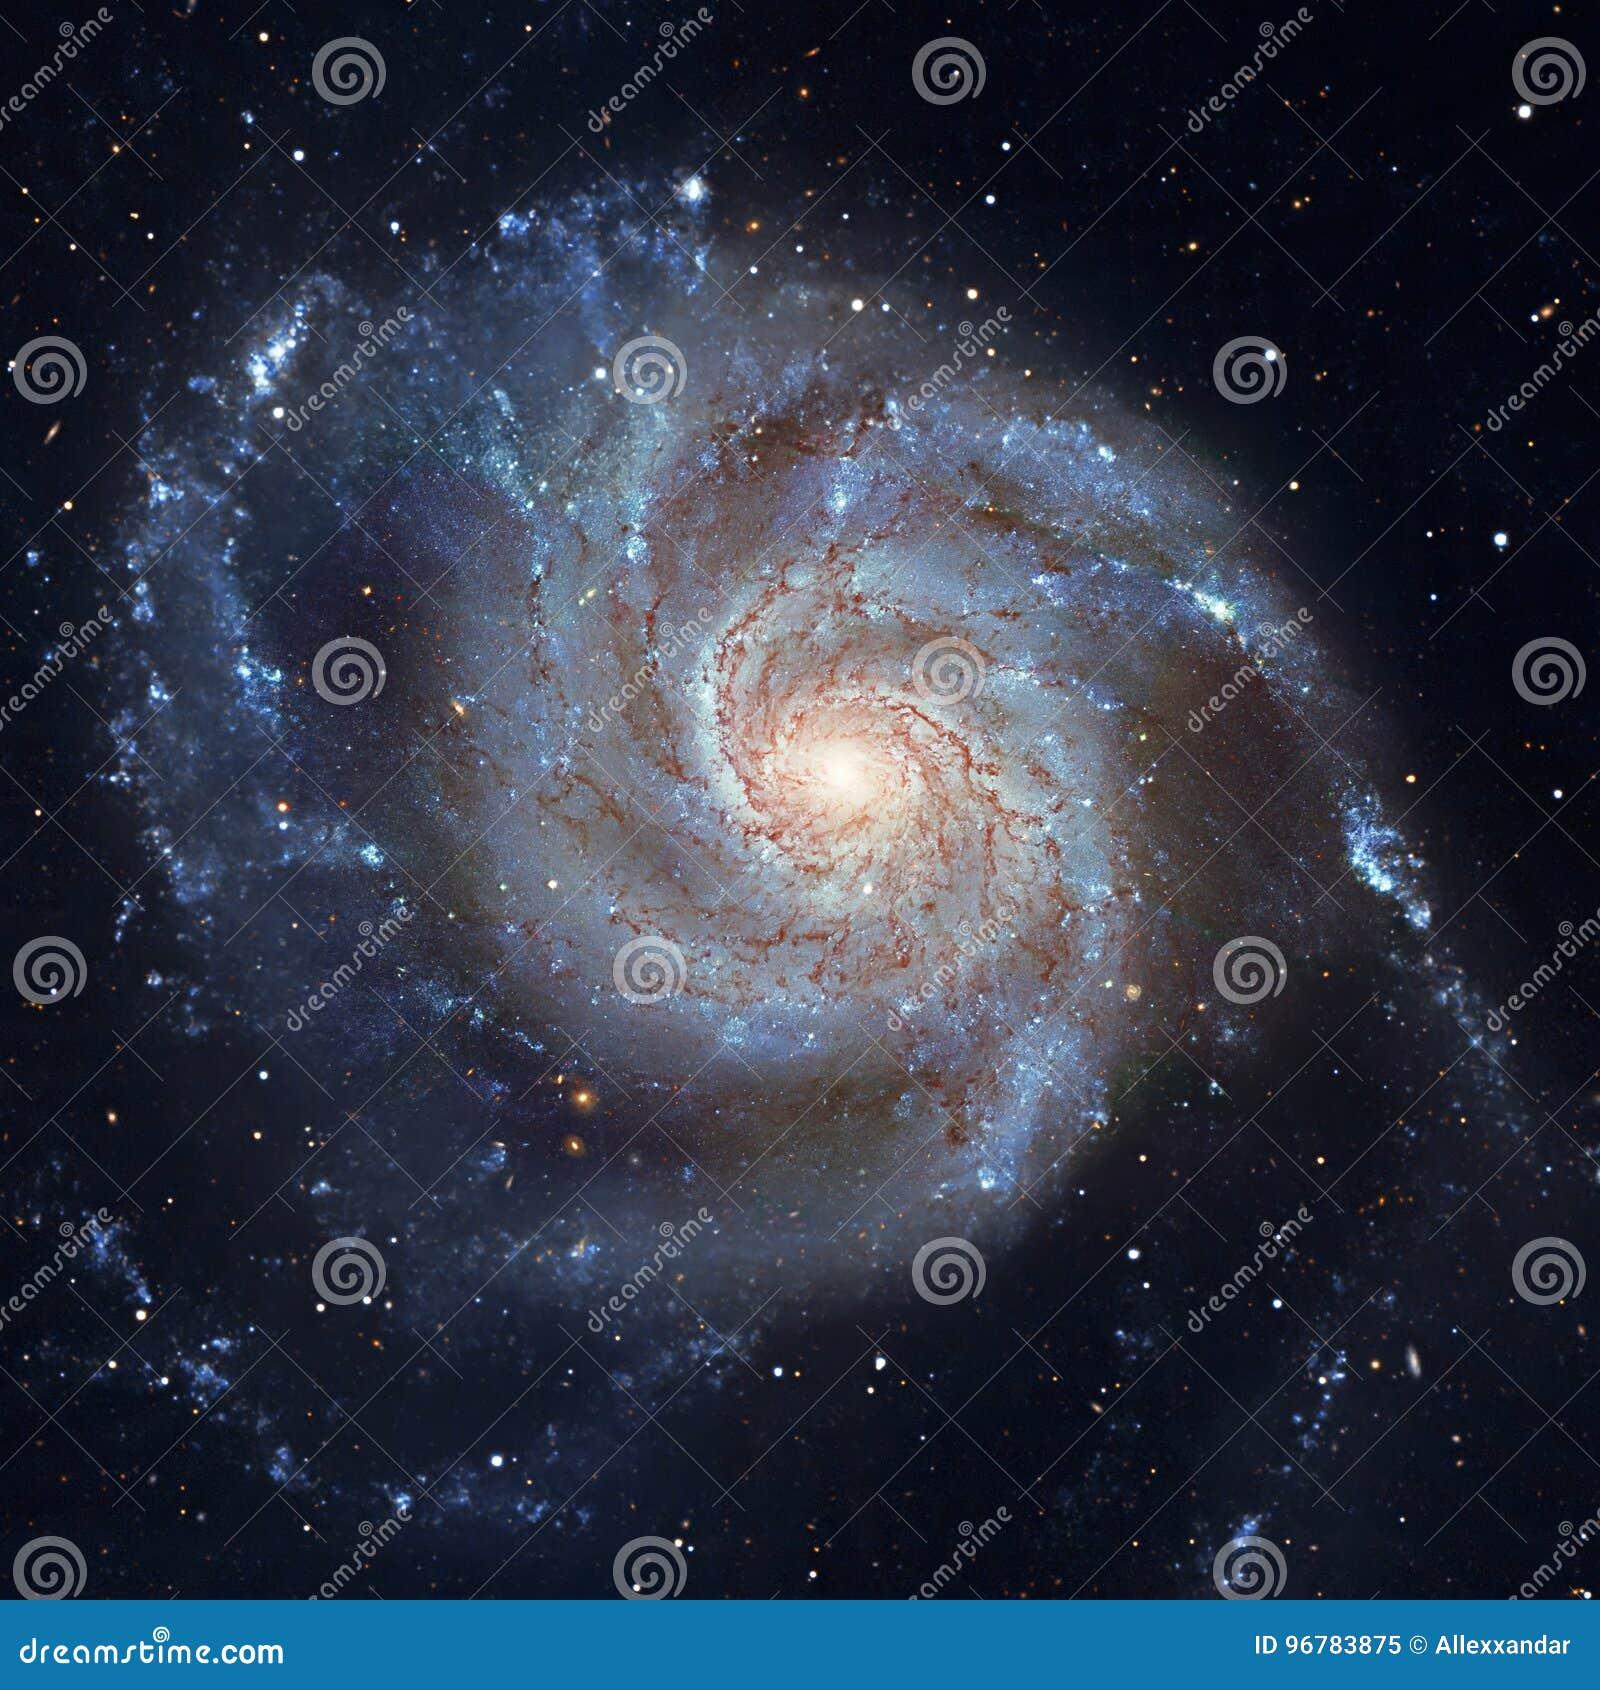 Pinwheel Galaxy Messier 101, M101 in the constellation Ursa Major